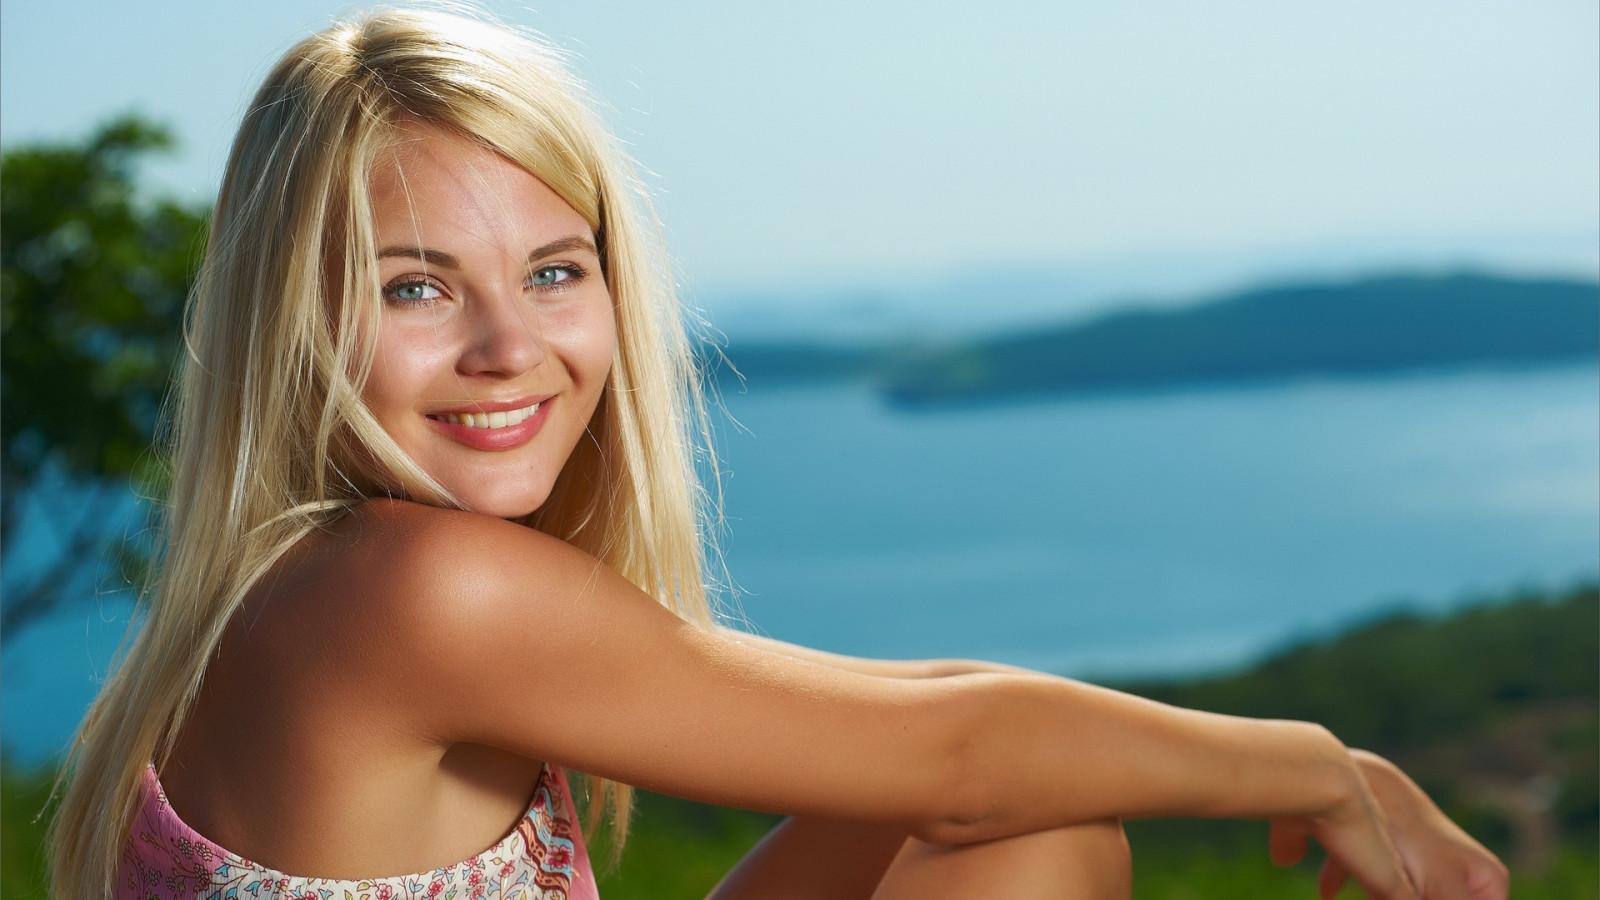 Wallpaper Face Model Blonde Long Hair Blue Eyes: Wallpaper : Face, Women Outdoors, Blonde, Long Hair, Blue